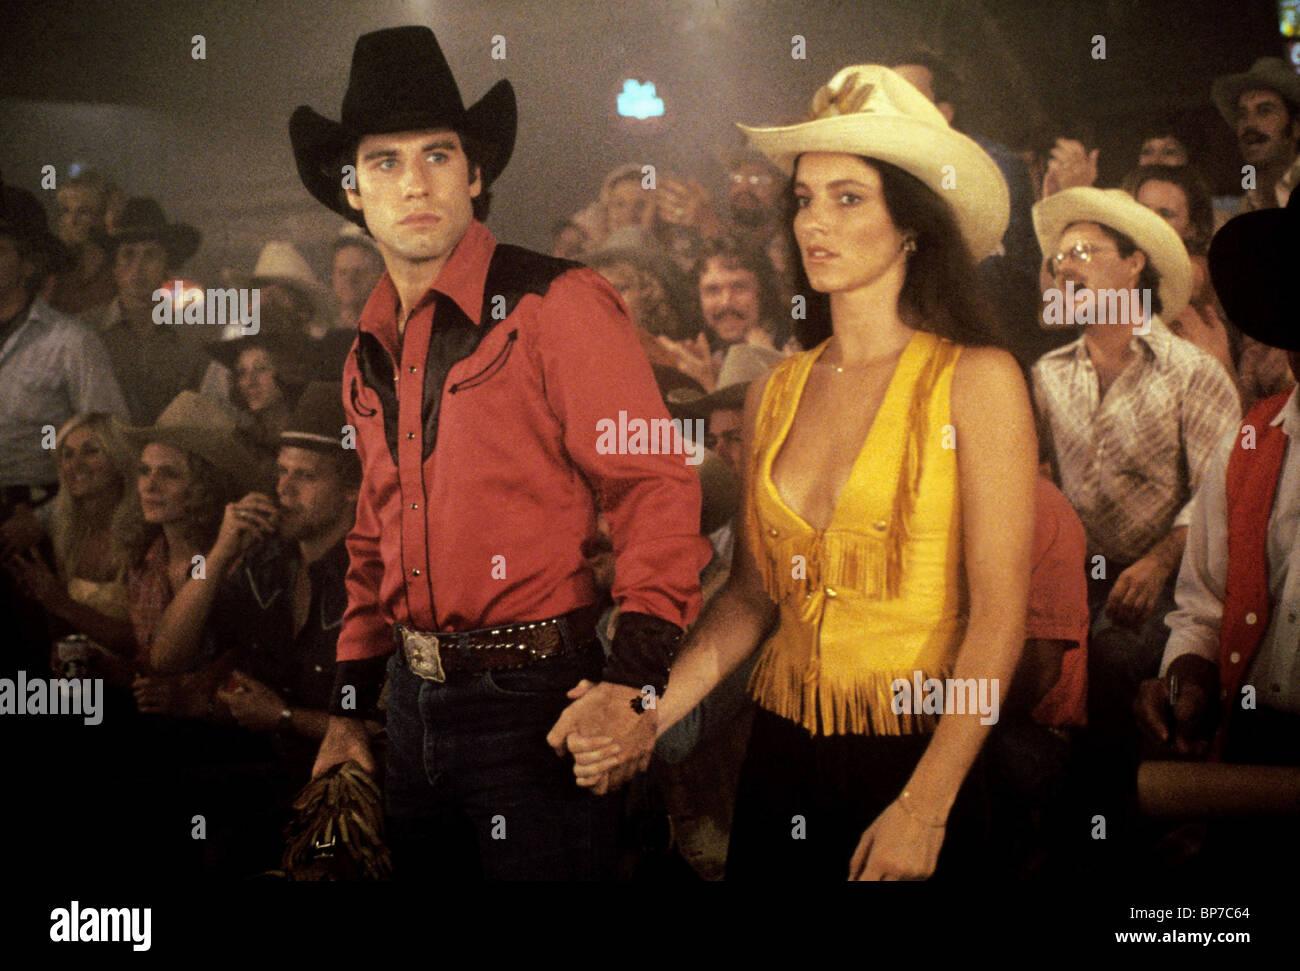 Photo - JOHN TRAVOLTA  amp  MADOLYN SMITH-OSBORNE URBAN COWBOY  1980Madolyn Smith Urban Cowboy